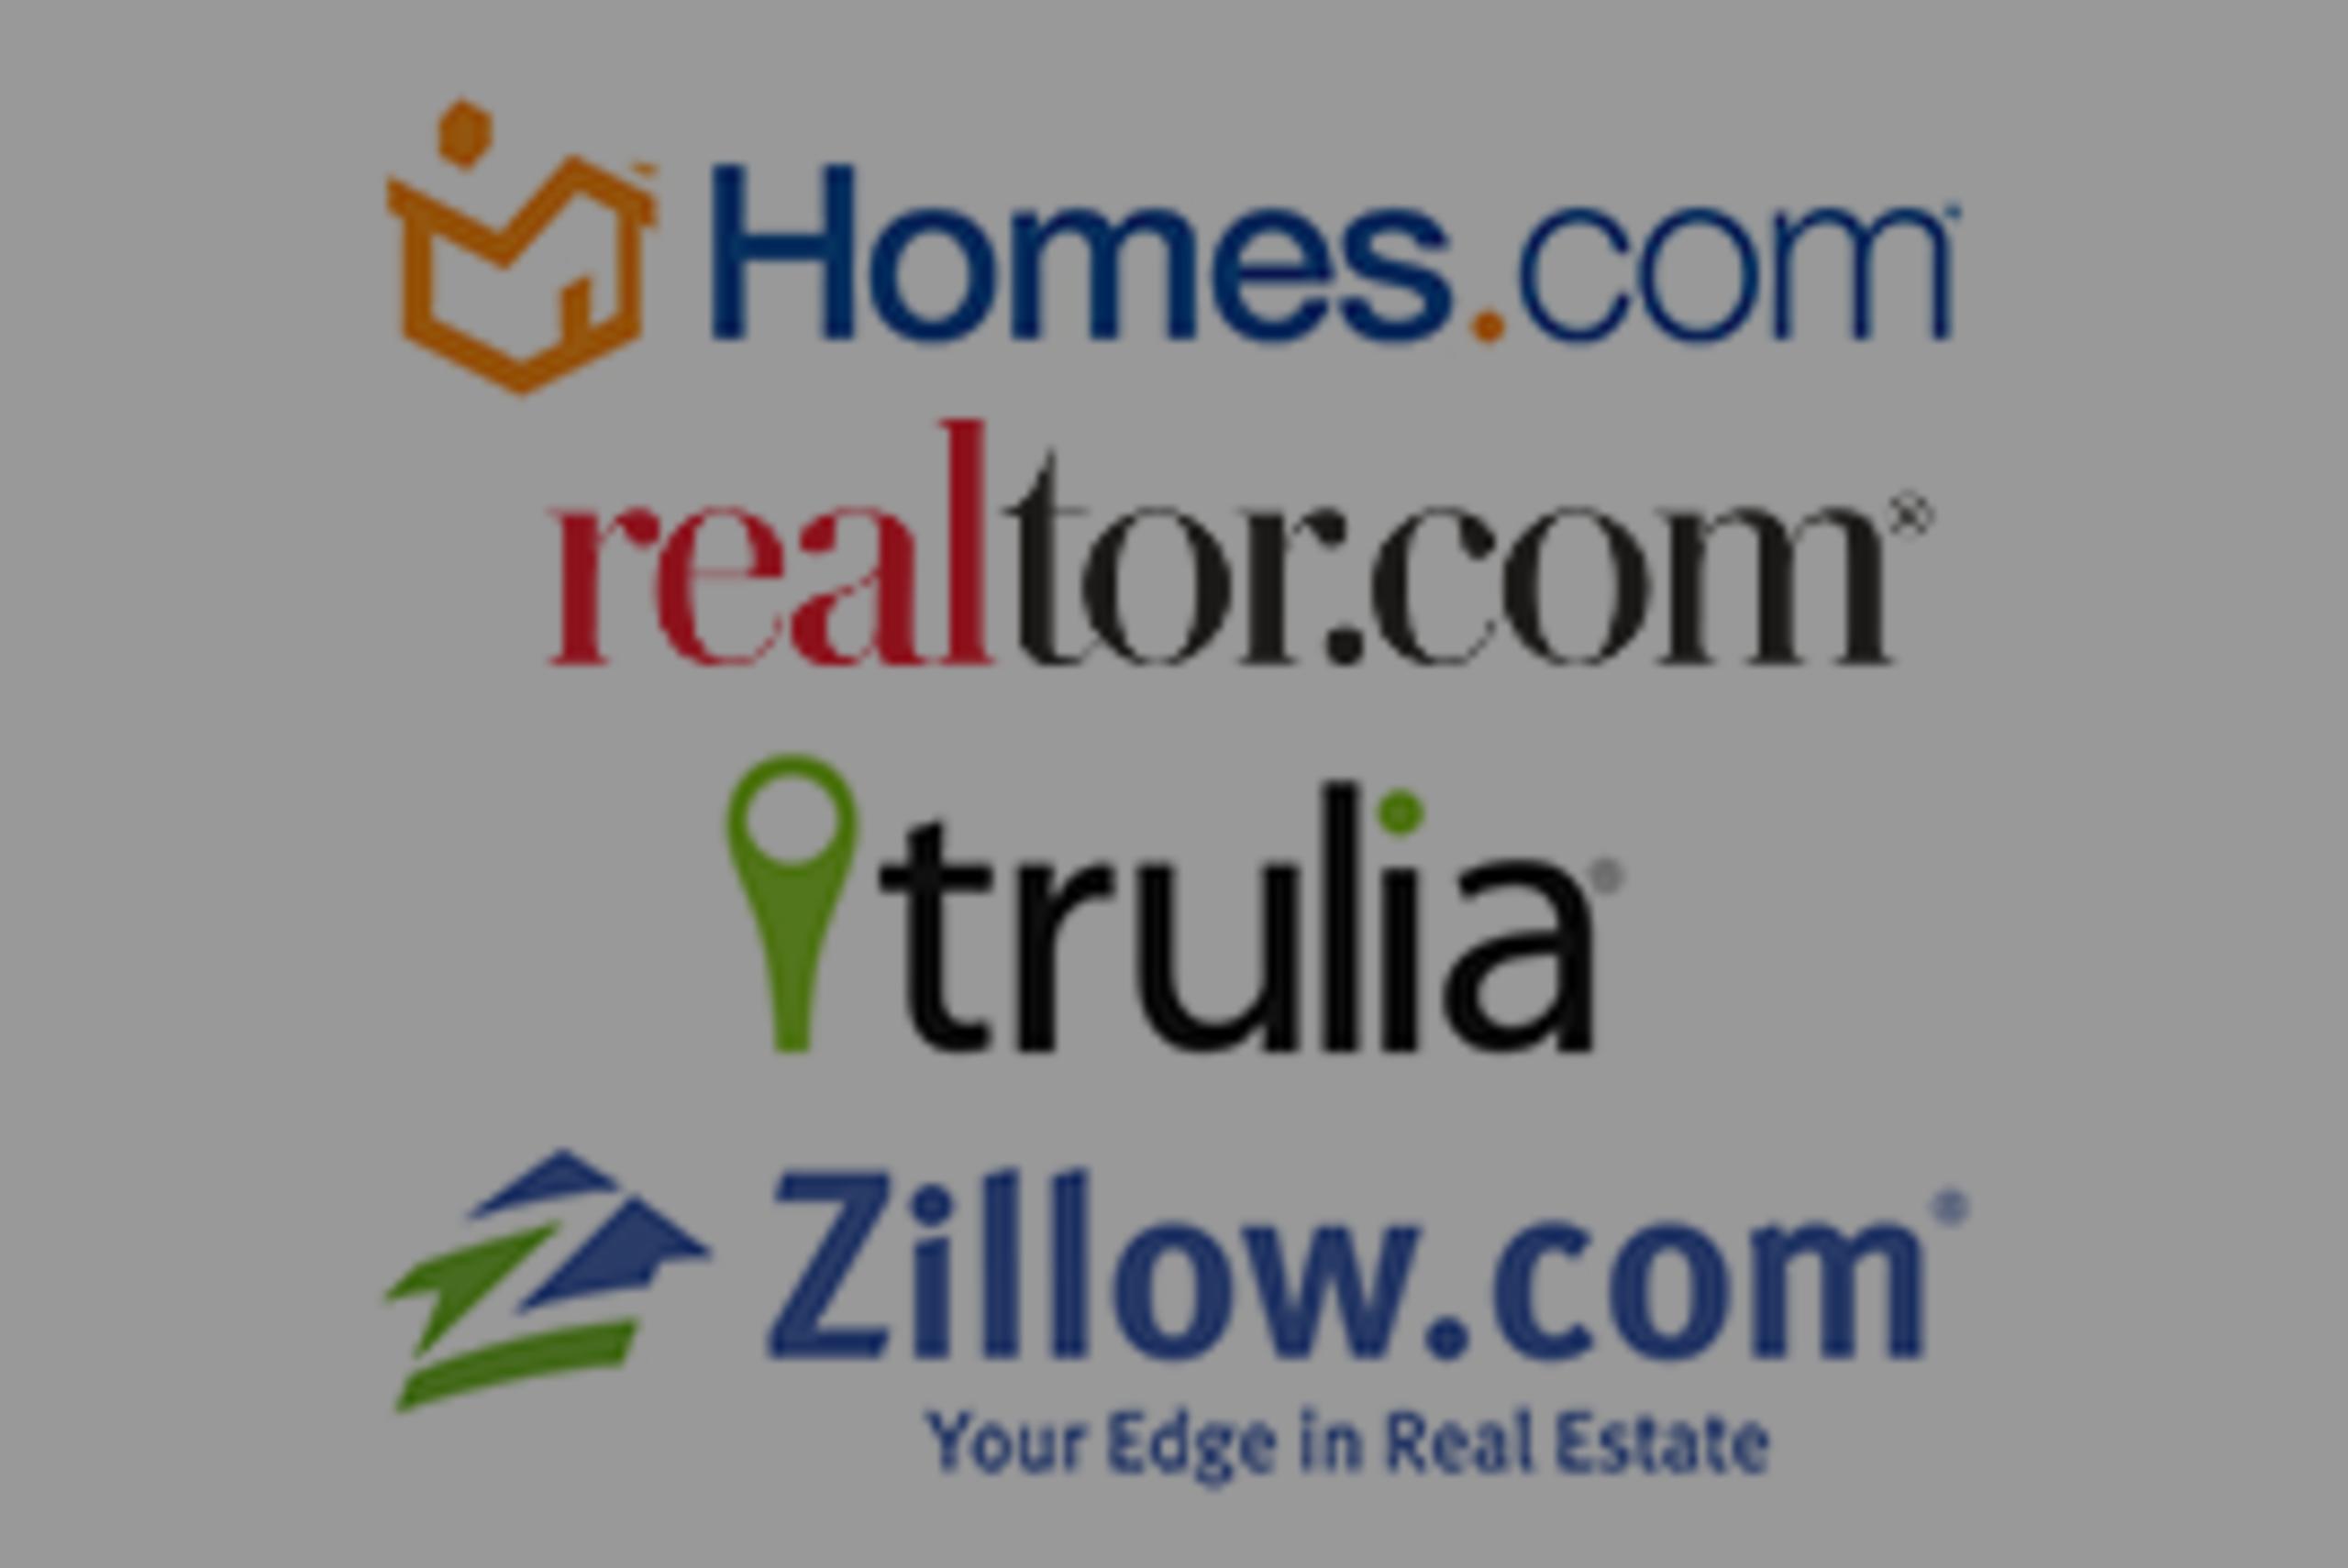 Real Opinion: Zillow, Realtor.com, Trulia